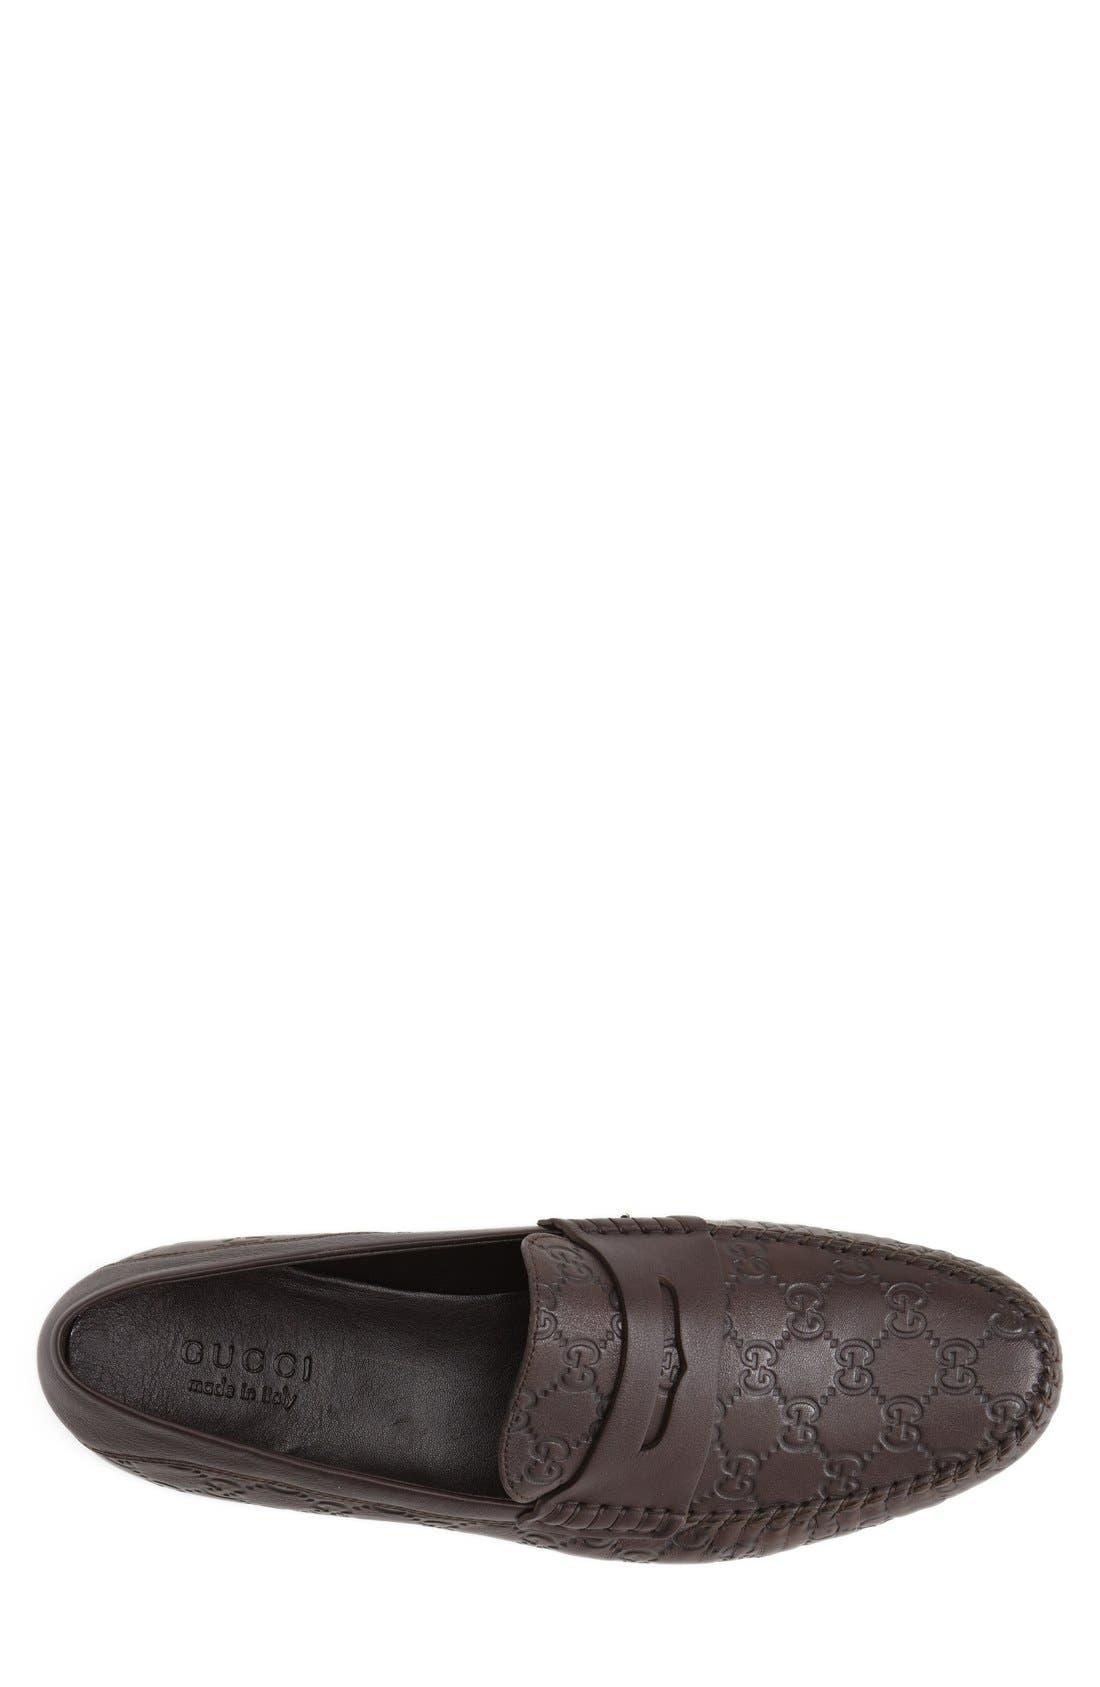 San Marino Driving Shoe,                             Alternate thumbnail 3, color,                             Dark Chocolate